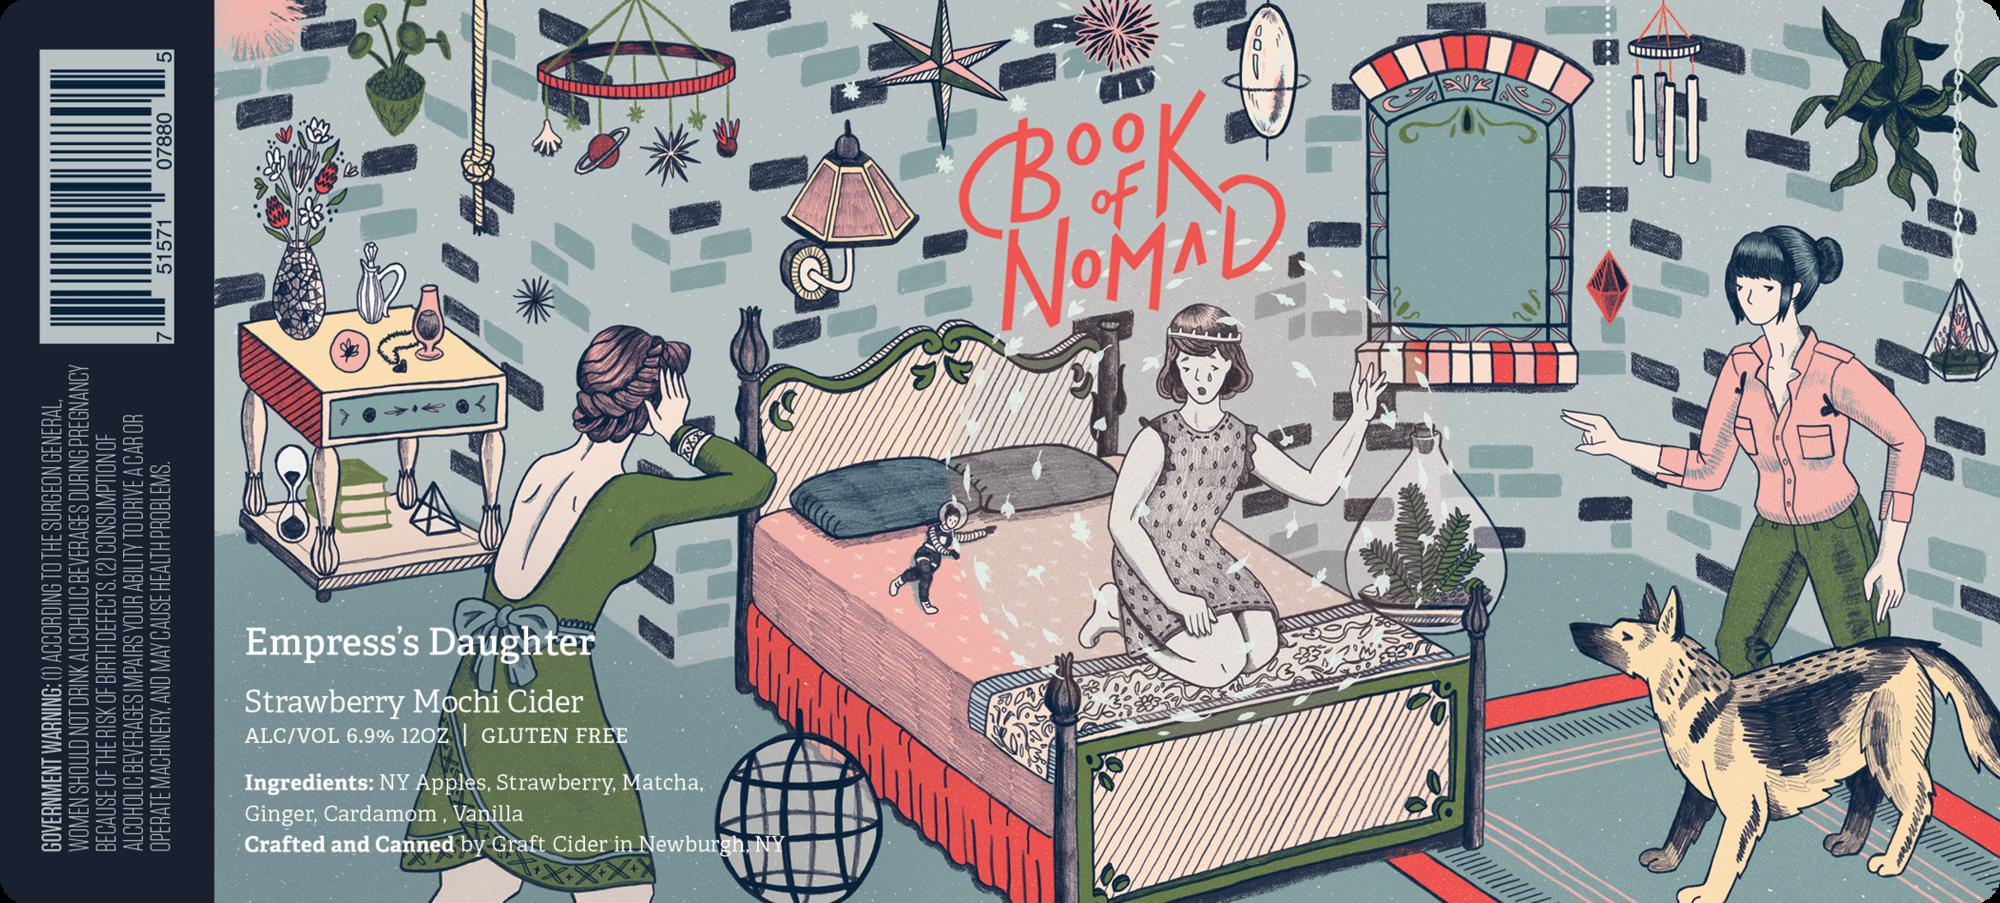 Graft: Book of Nomad: Empress's Daughter Beer